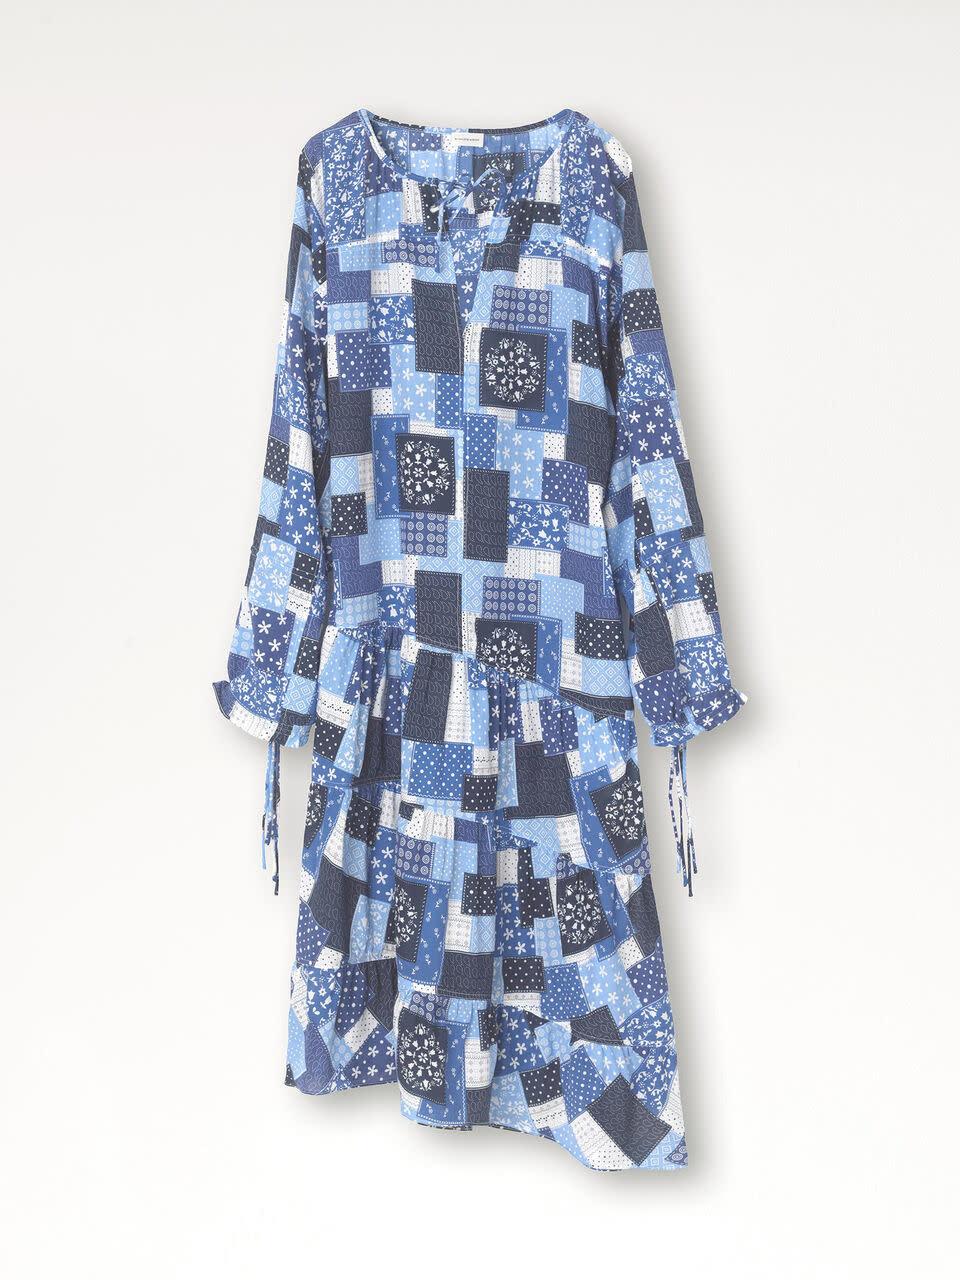 Amily dress by malene birger-4